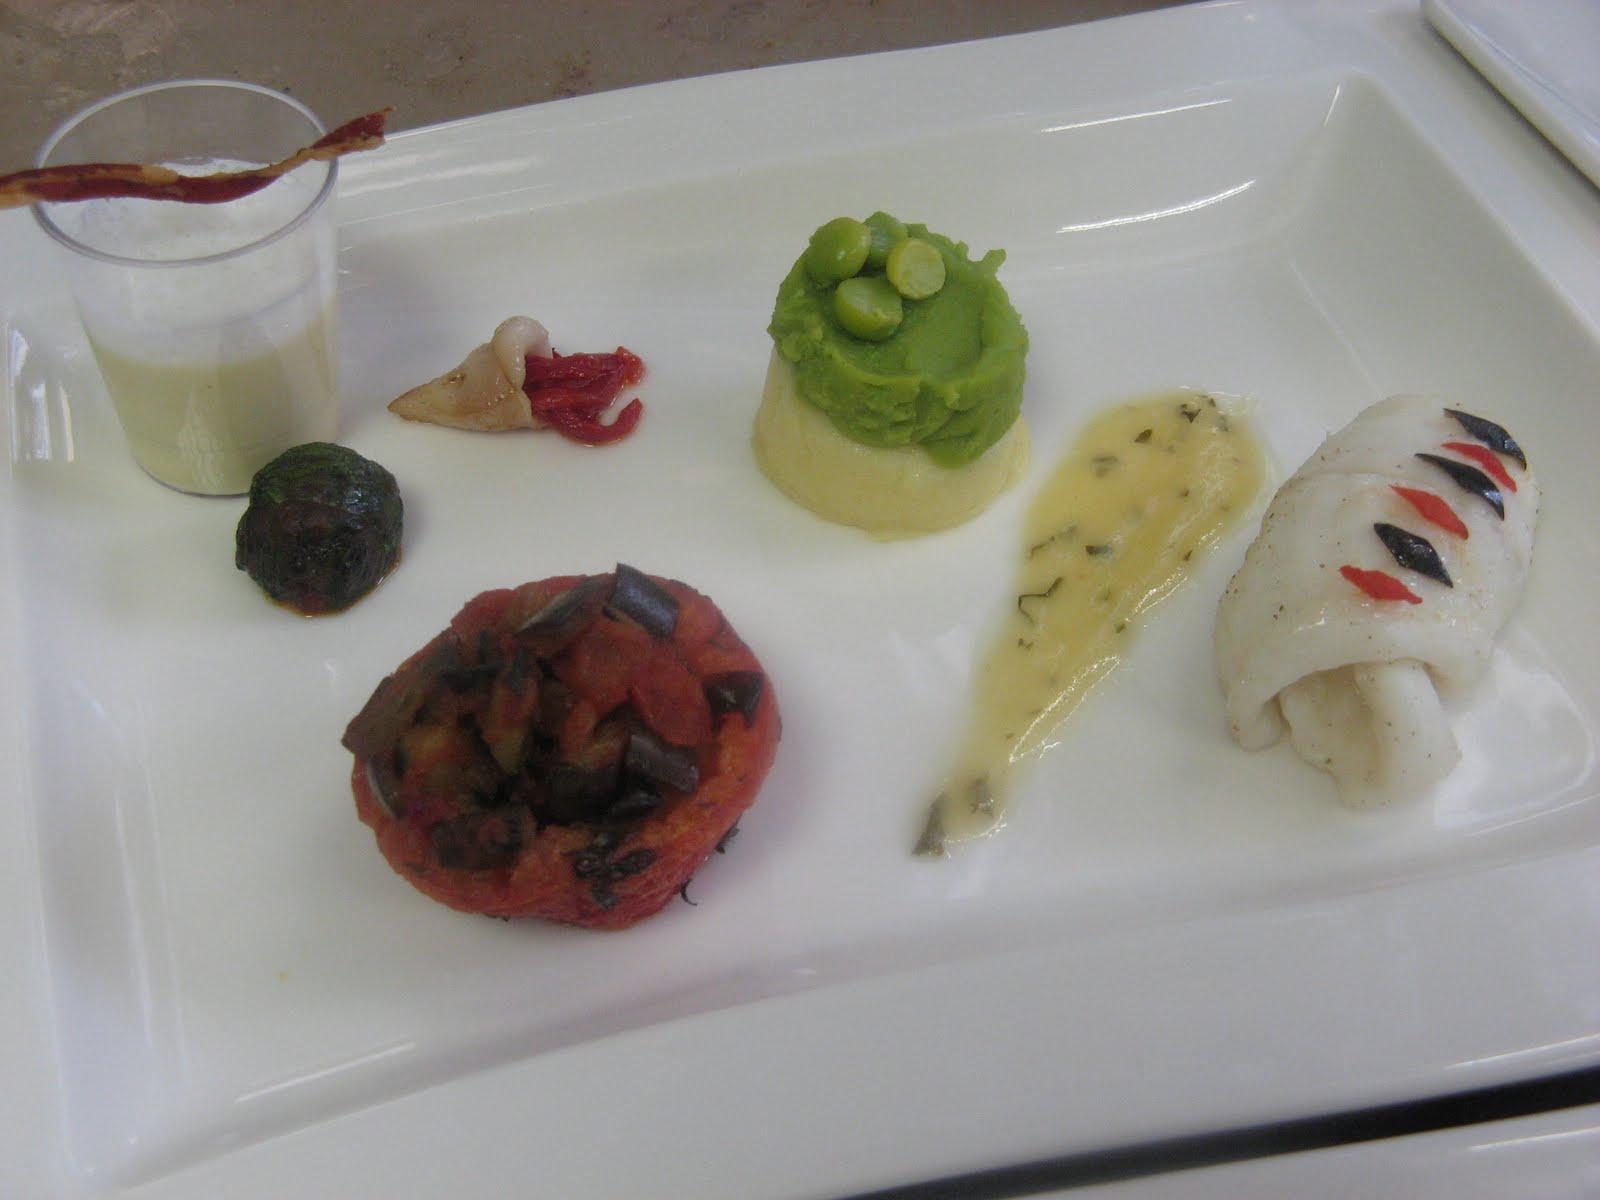 sjoerd at le cordon bleu paris superior cuisine 2010 06. Black Bedroom Furniture Sets. Home Design Ideas